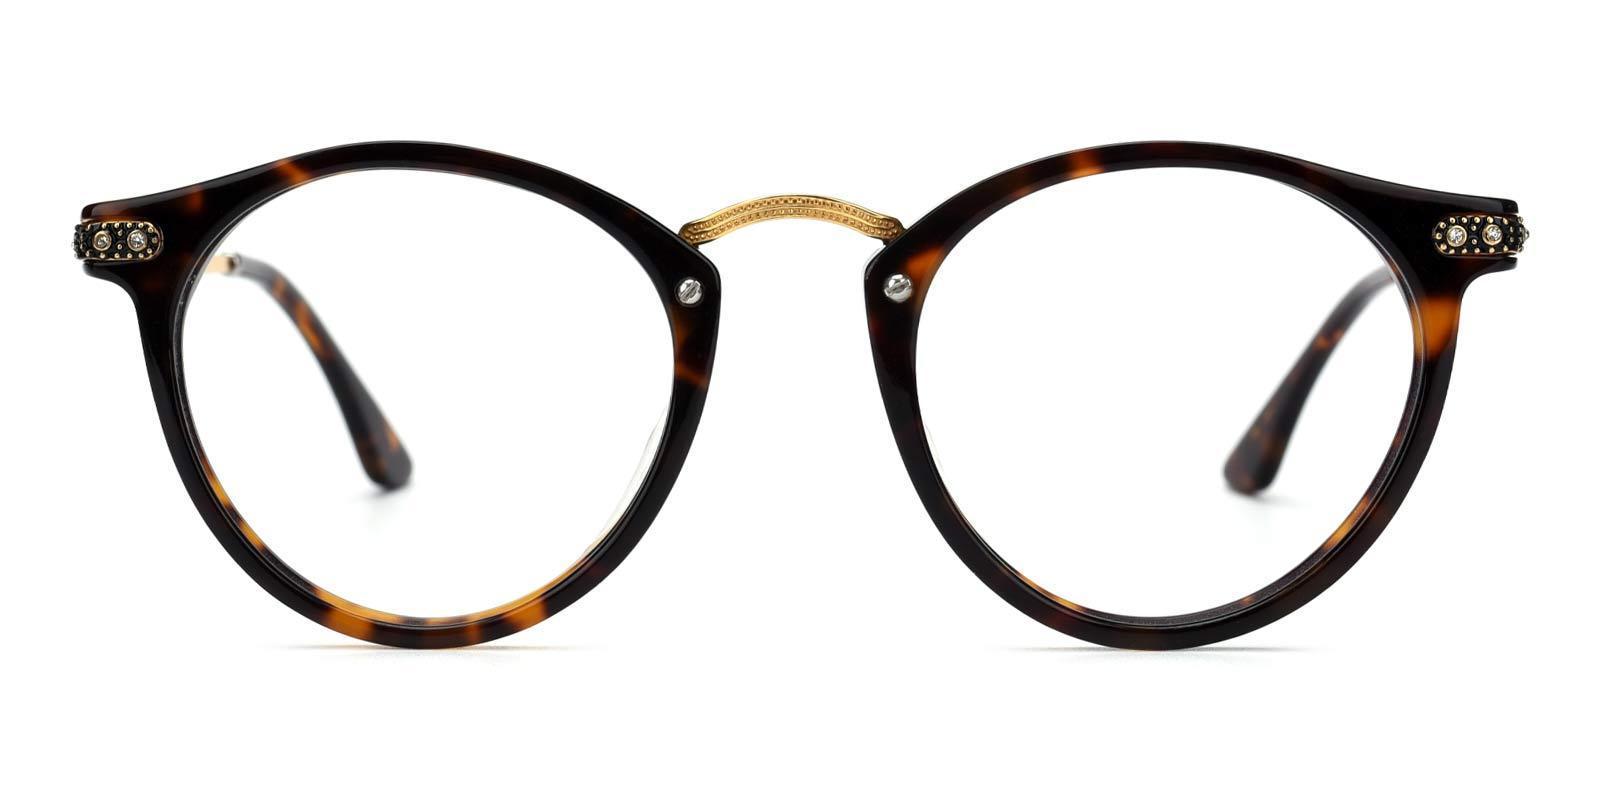 Donna-Tortoise-Round-Acetate-Eyeglasses-additional2